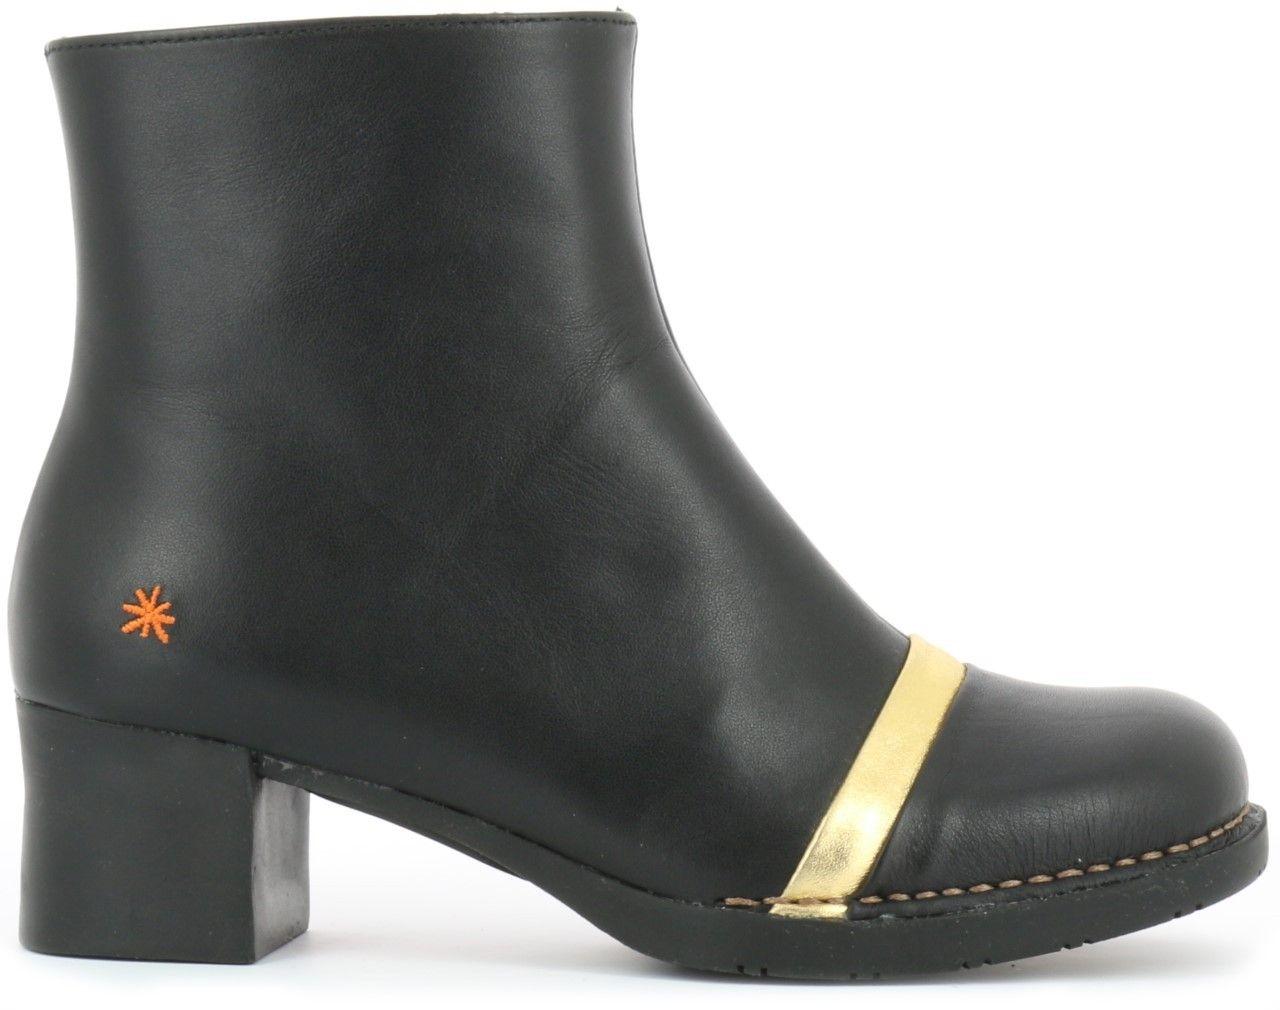 c836e9efe97 Art støvle Bristol Black/Gold - sko og fodtøj – MANIA Copenhagen ...